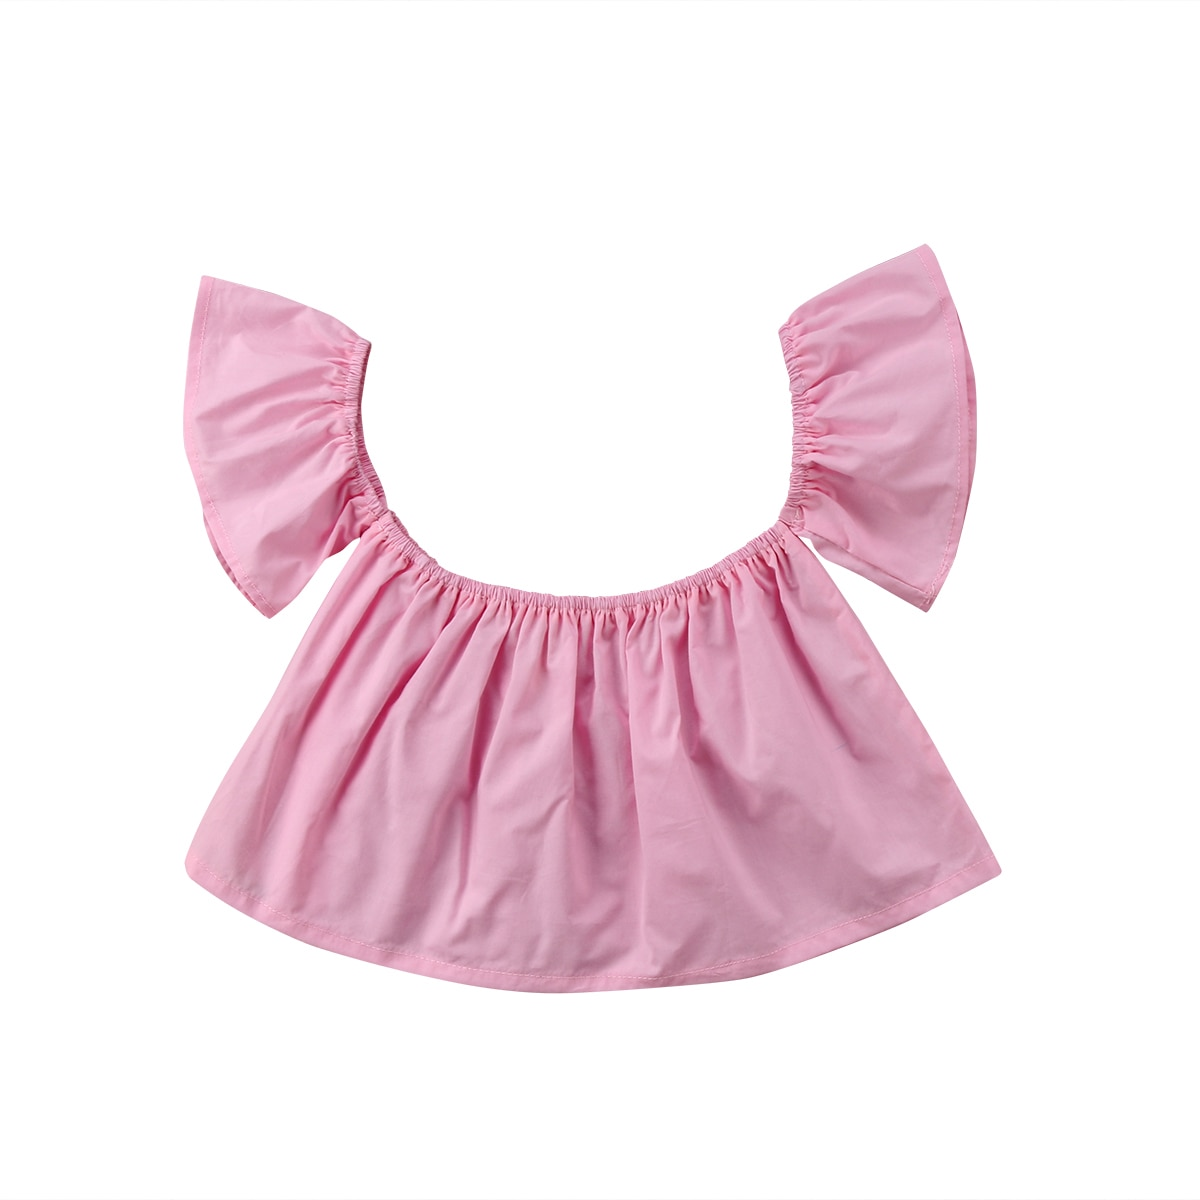 Newborn Baby Girls Princess Wedding Sunsuit Blouse Shirts Jumper Off Shoulder Cotton Sleeveless Summer Crop Top Clothing Blouses